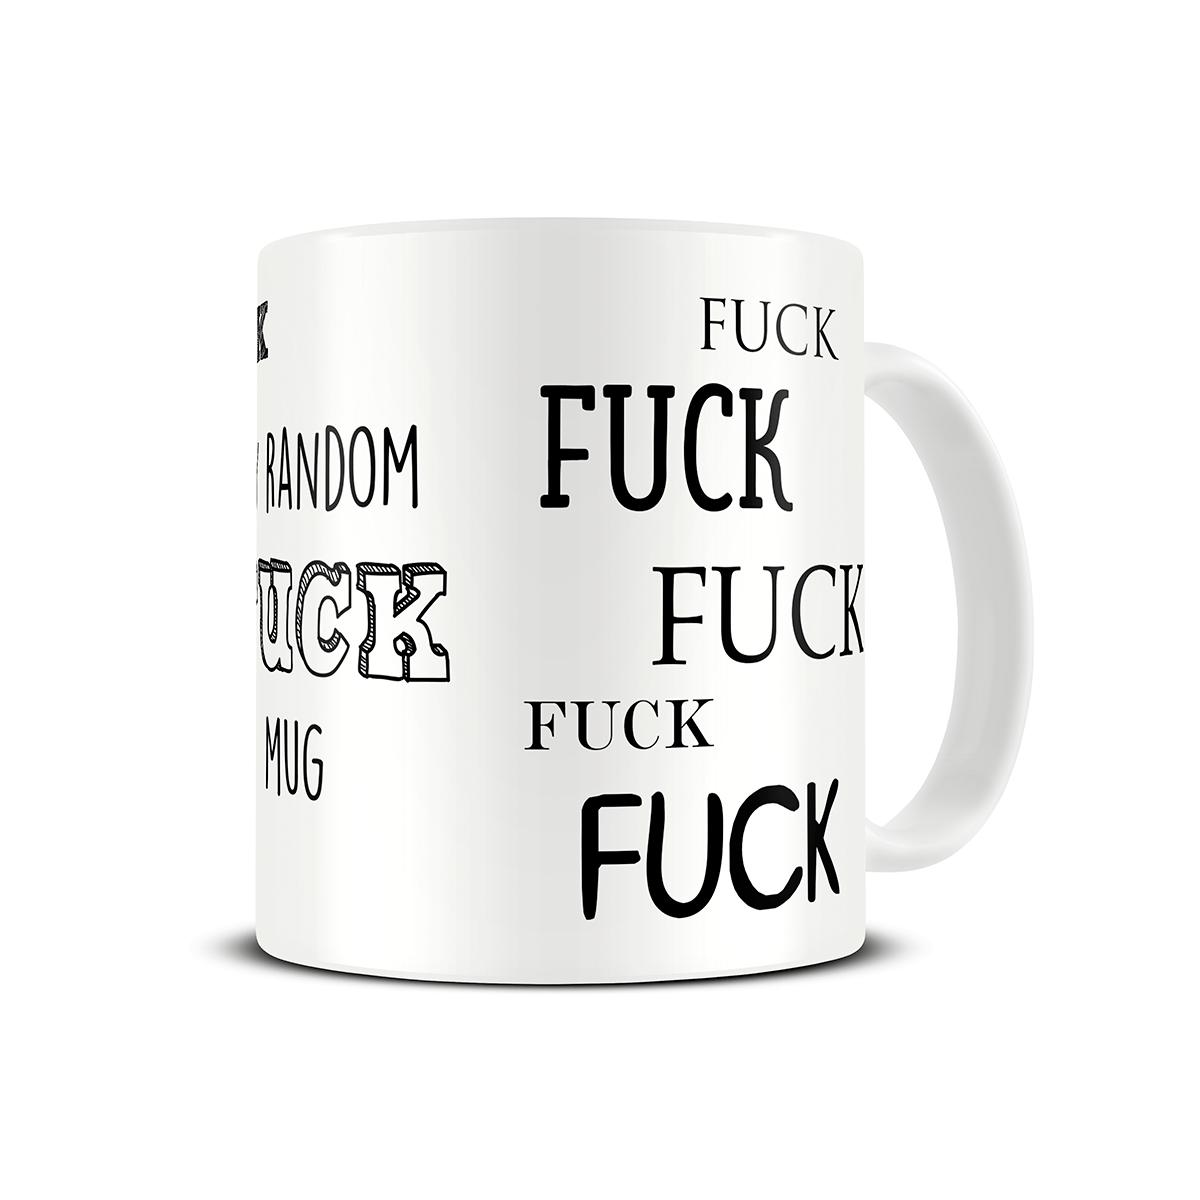 funny-swearing-coffee-mug-random-fuk